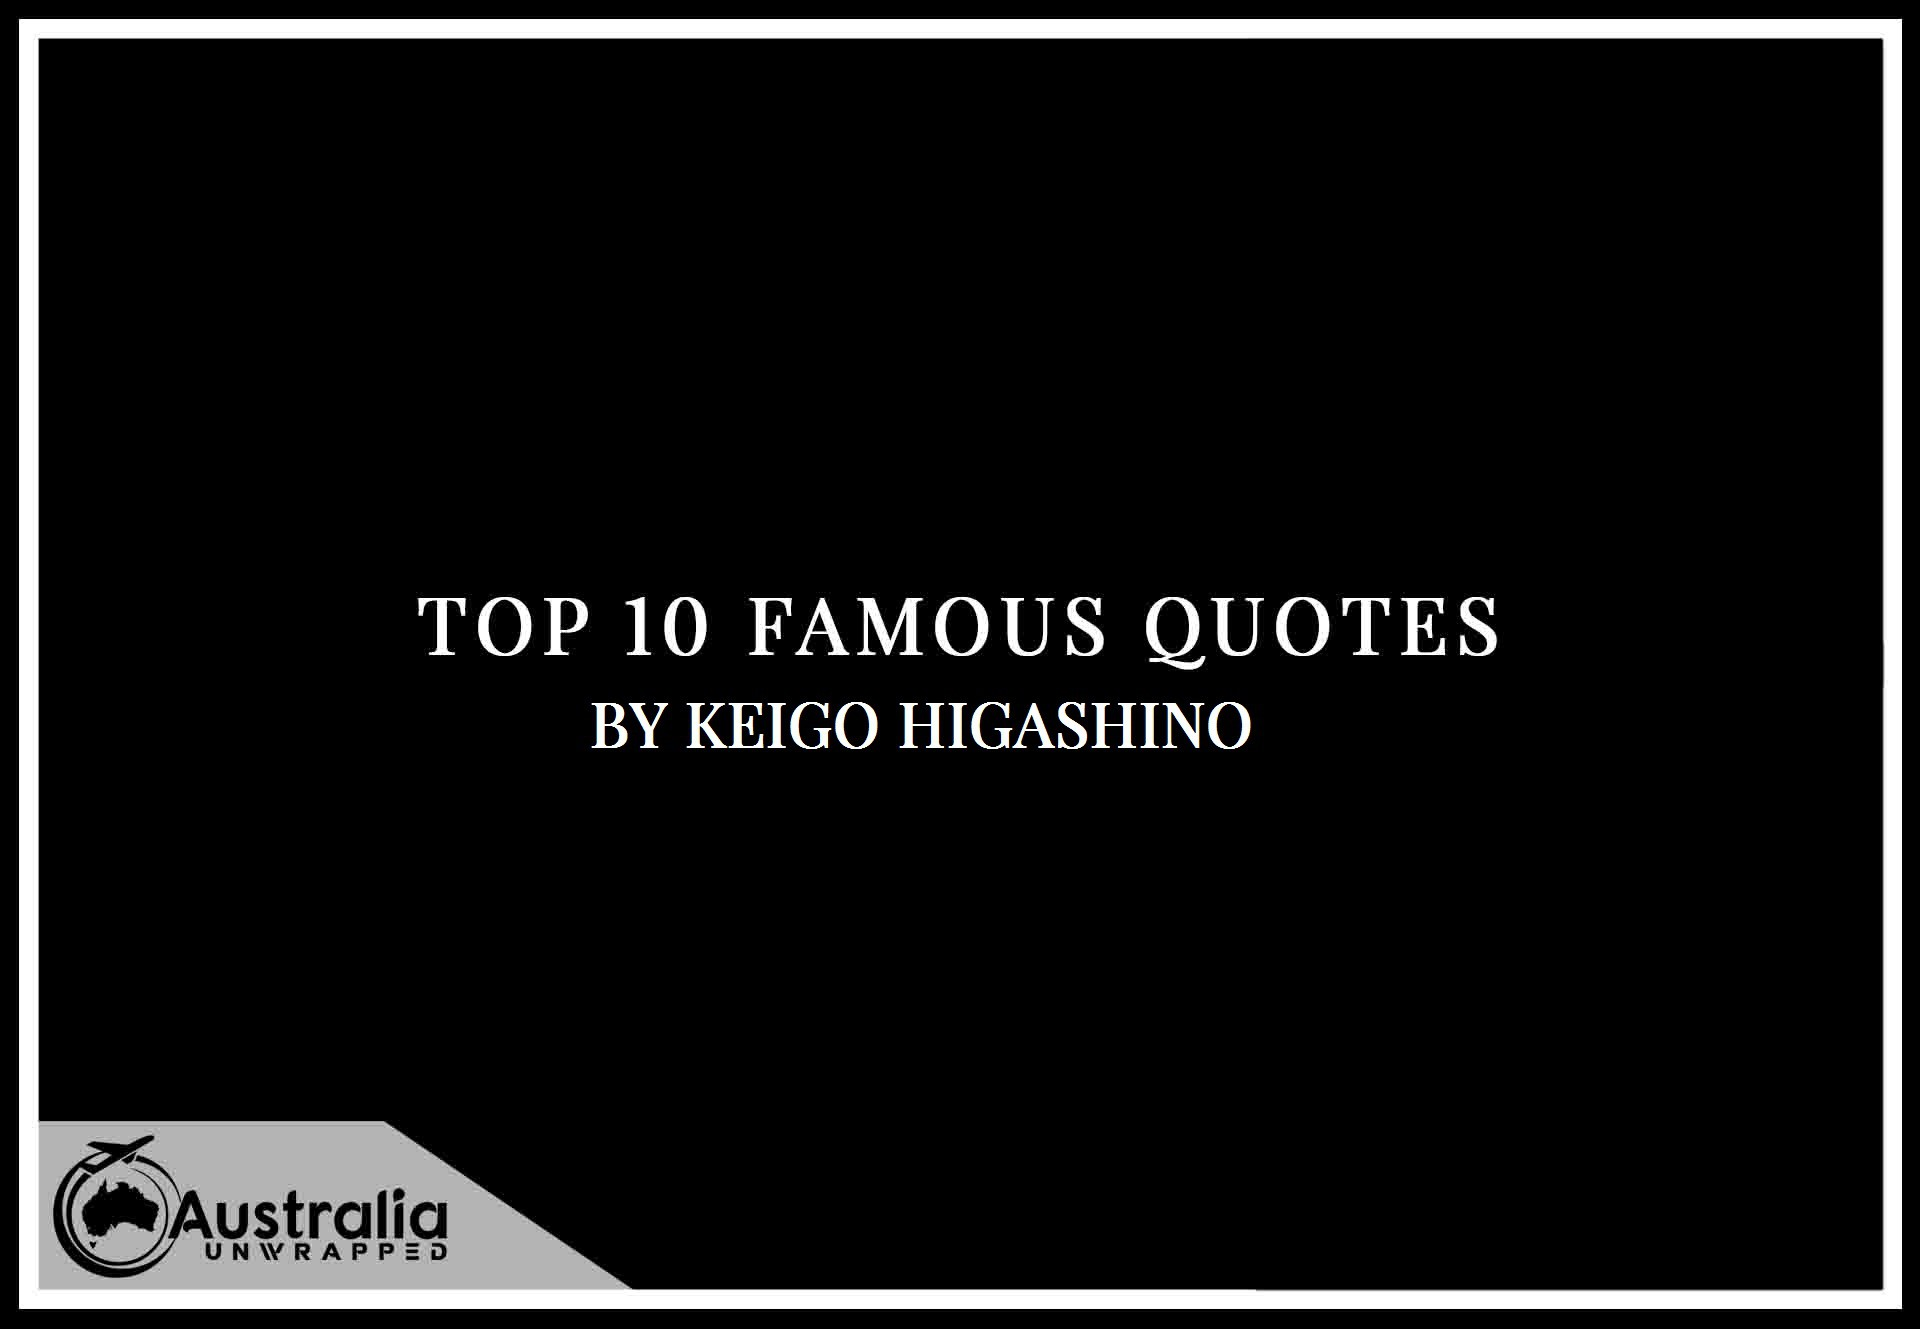 Keigo Higashino's Top 10 Popular and Famous Quotes